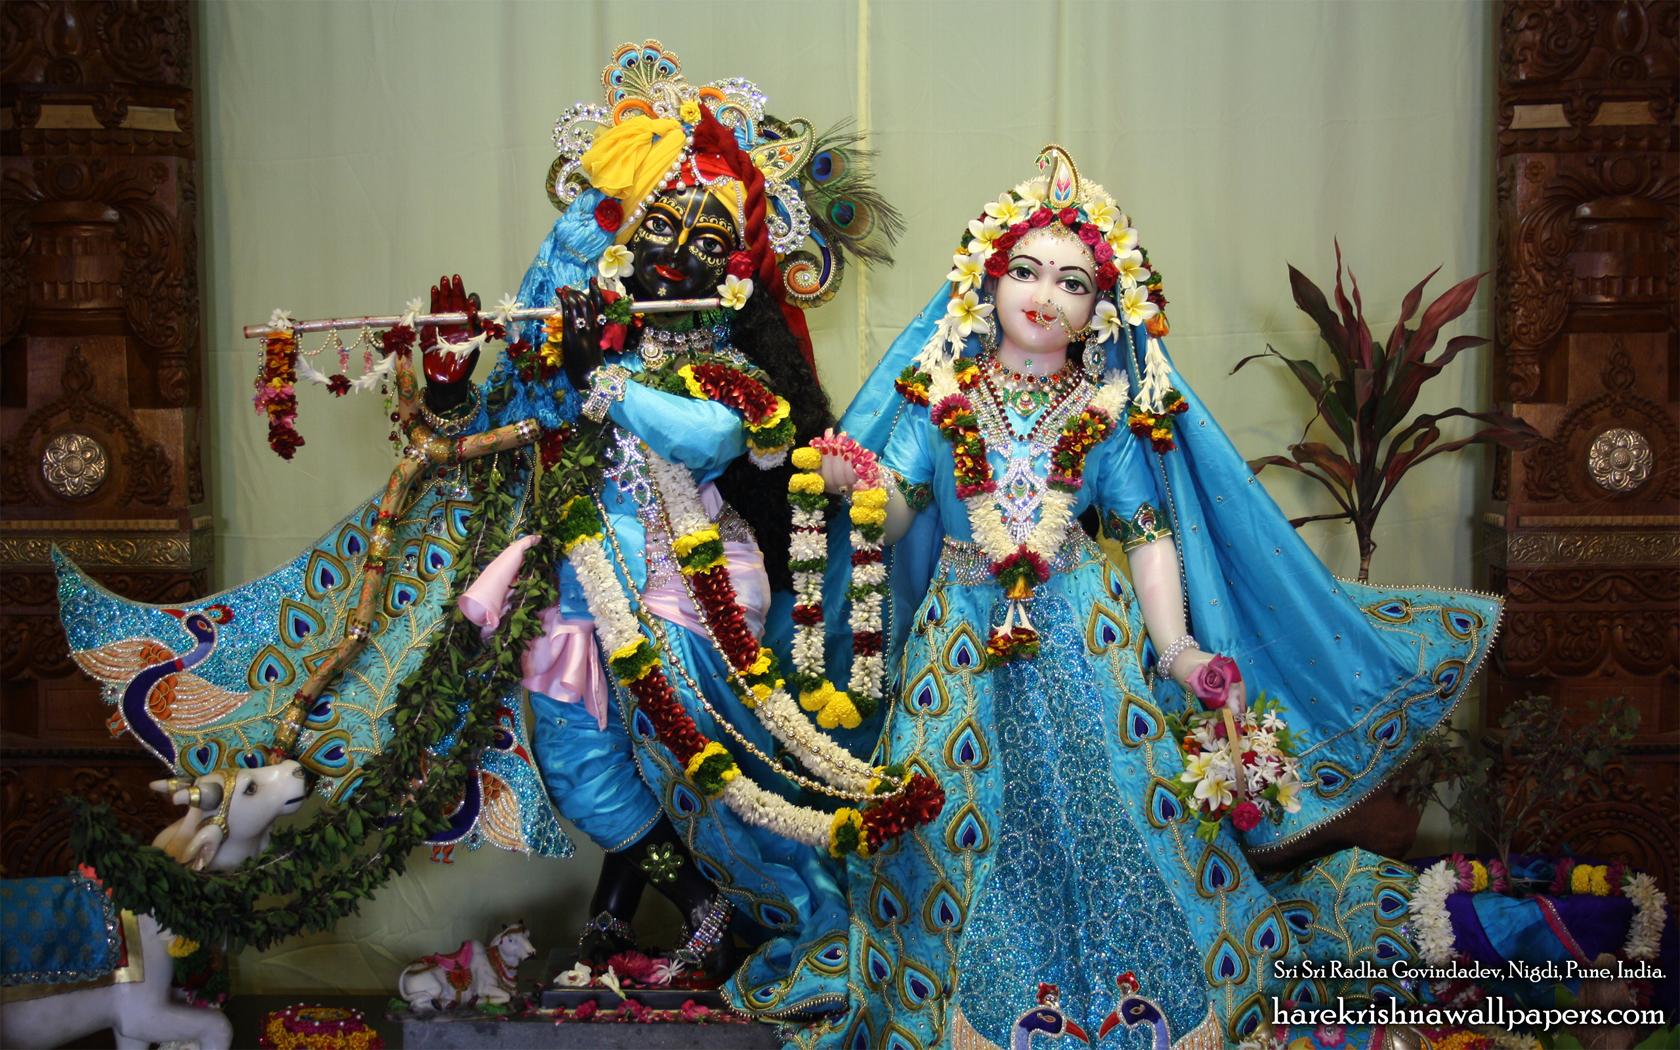 Sri Sri Radha Govind Wallpaper (030) Size 1680x1050 Download